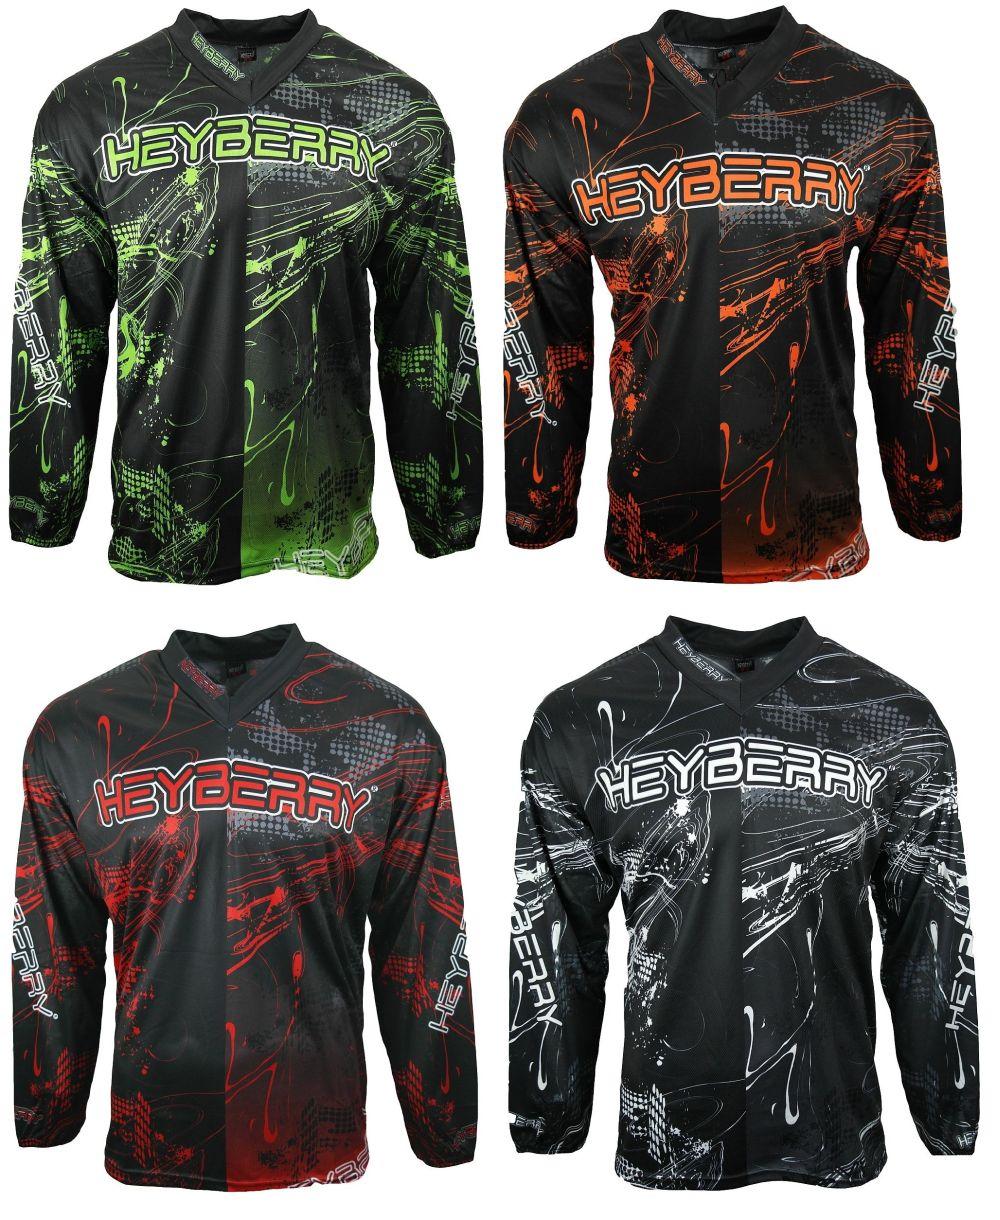 Heyberry MX-Cross Quad Motocross Shirt Jersey Trikot schwarz weiß orange M XXL